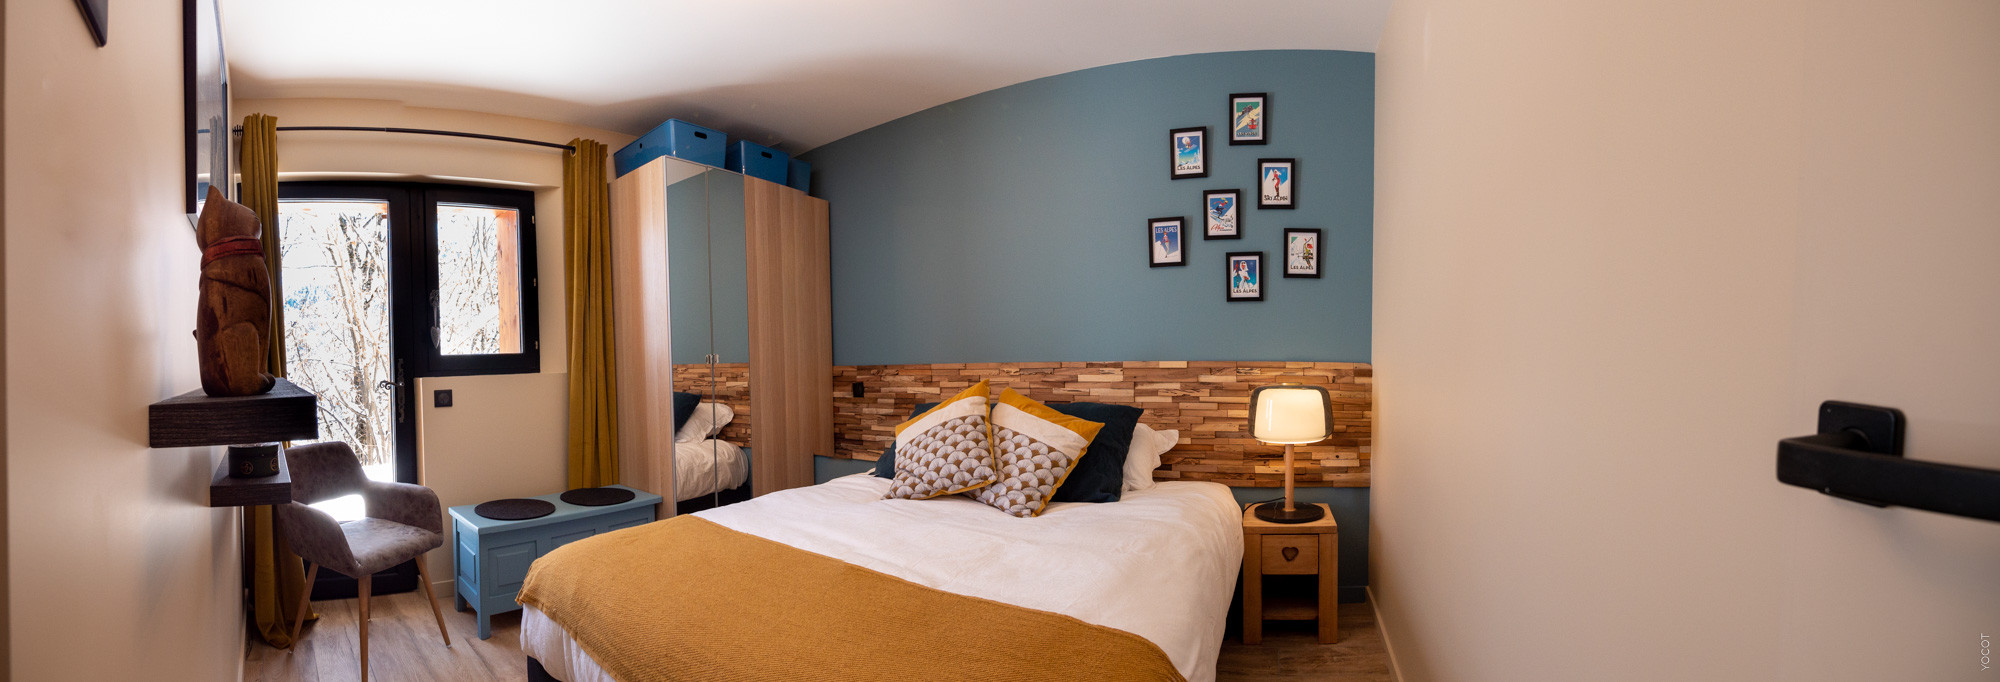 LA1150 Chambre Bleue.jpg